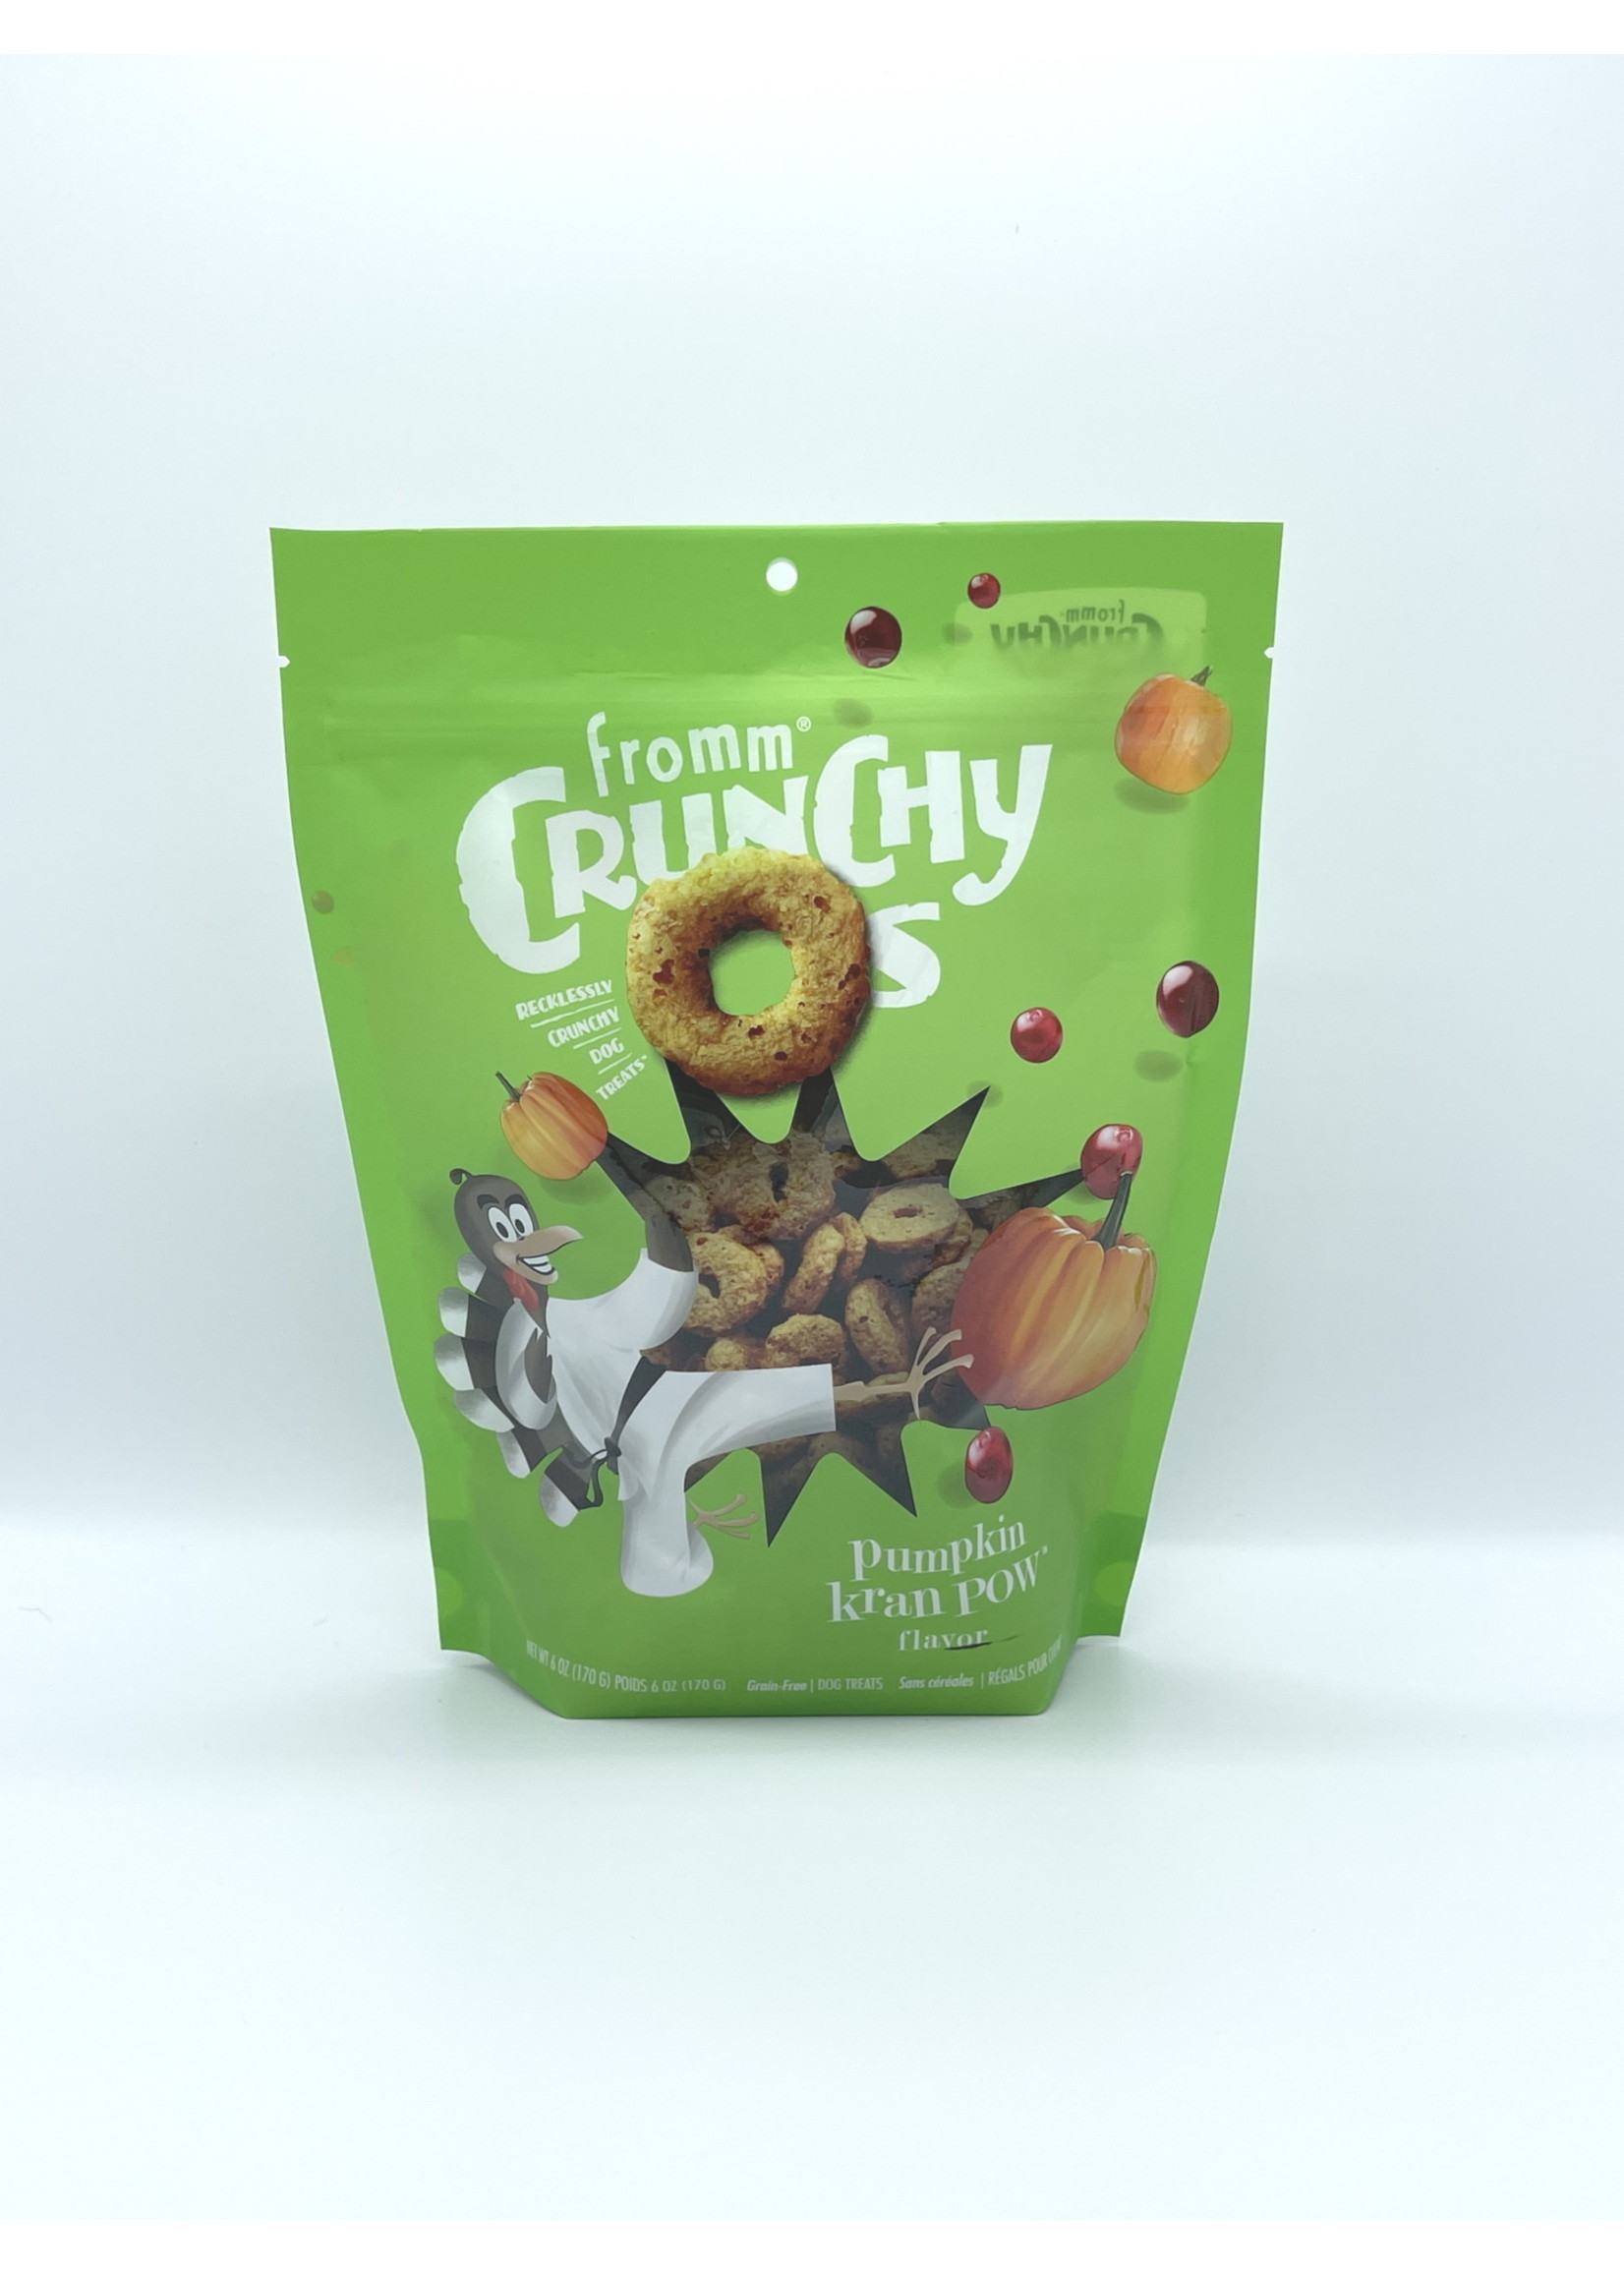 Fromm Fromm Crunchy O's Pumpkin Kran Pow